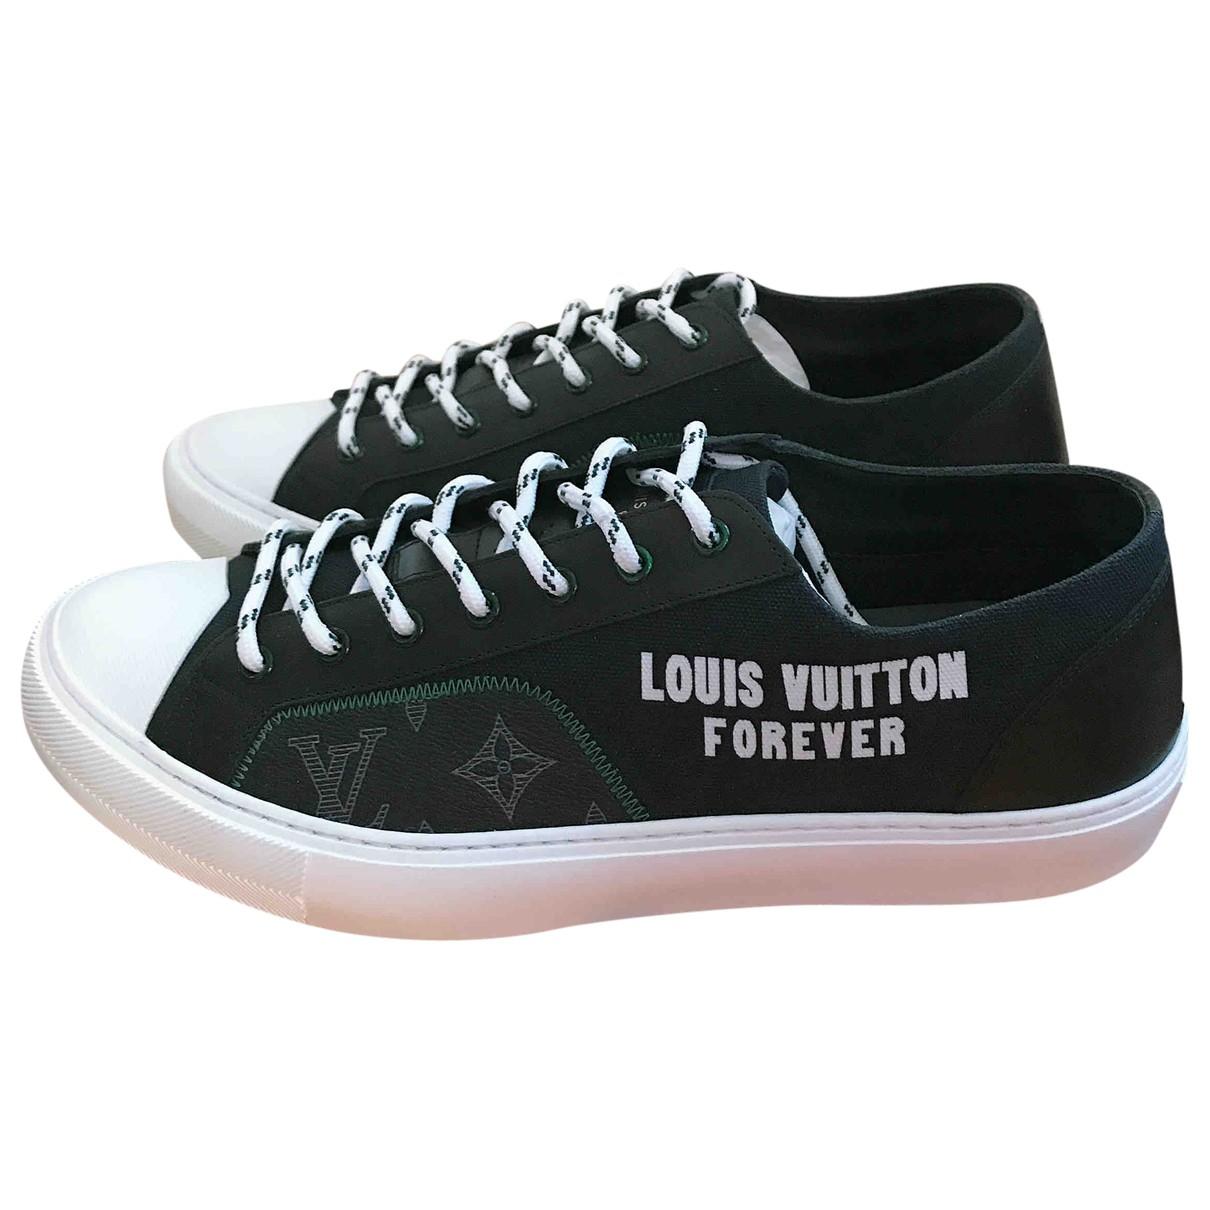 Louis Vuitton LV Tattoo Alpes  Black Cloth Trainers for Men 9 UK